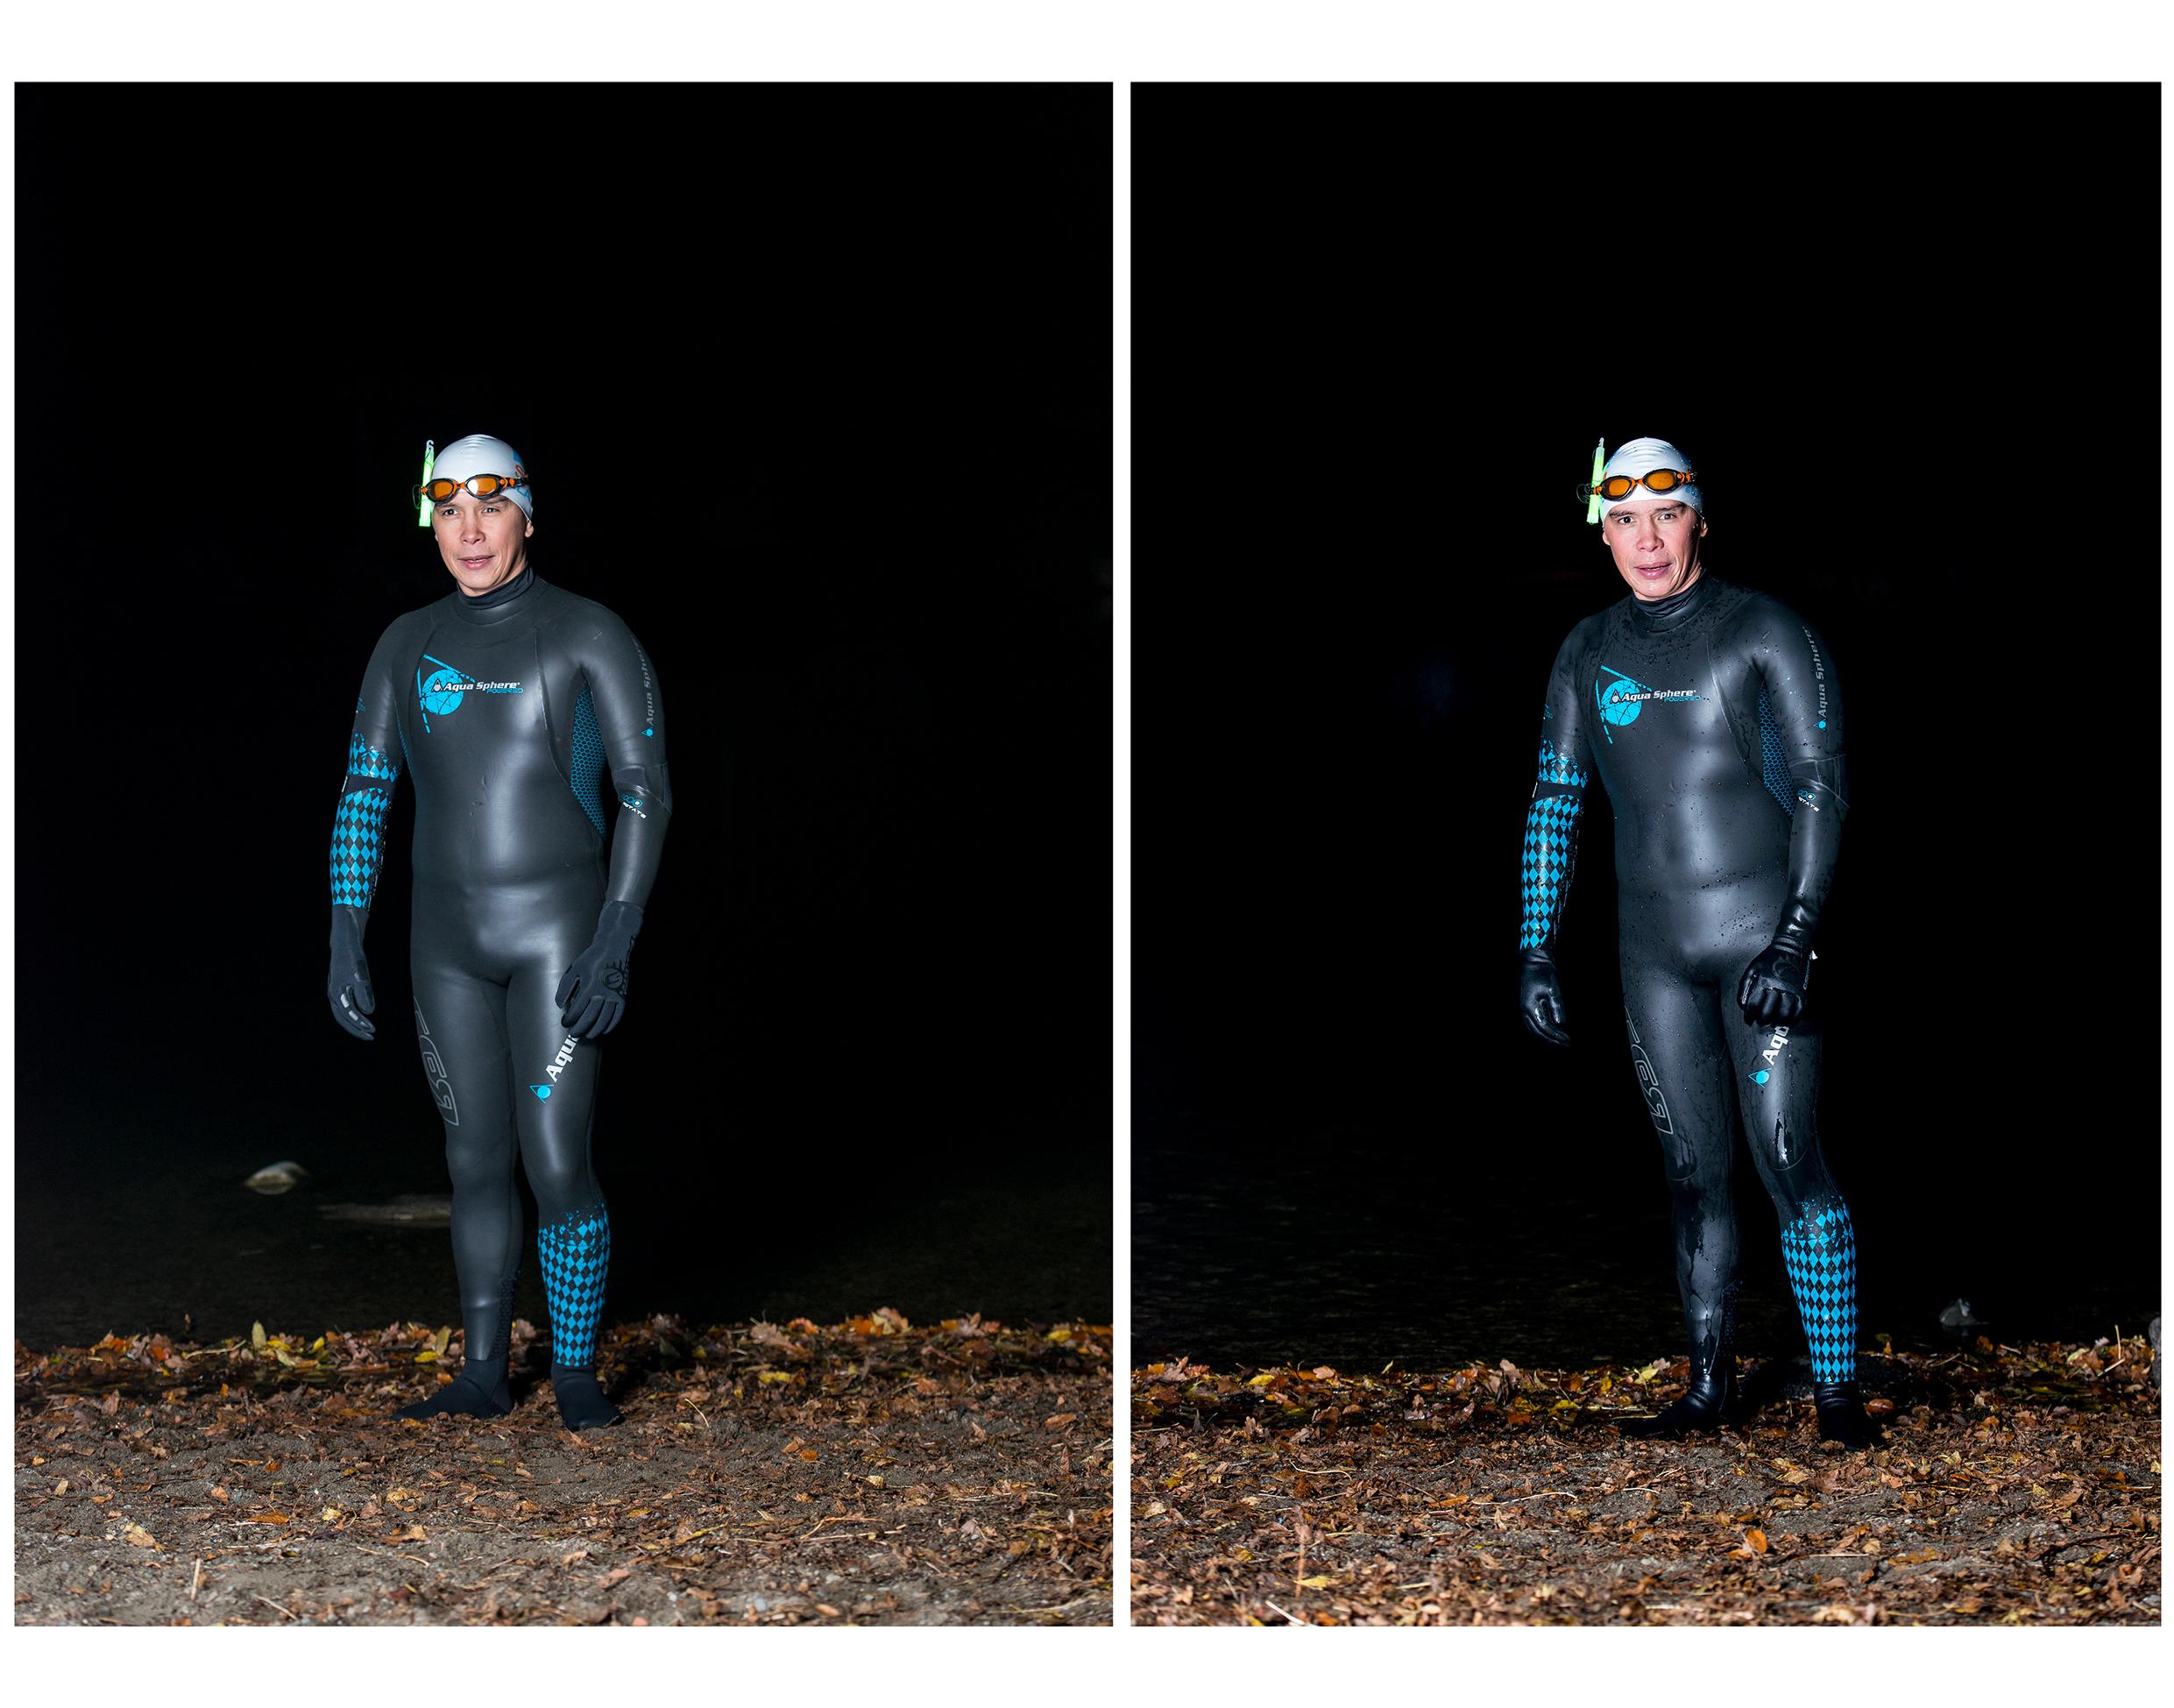 7_SwimTheLakes_28.10.16_AndyHughes.jpg